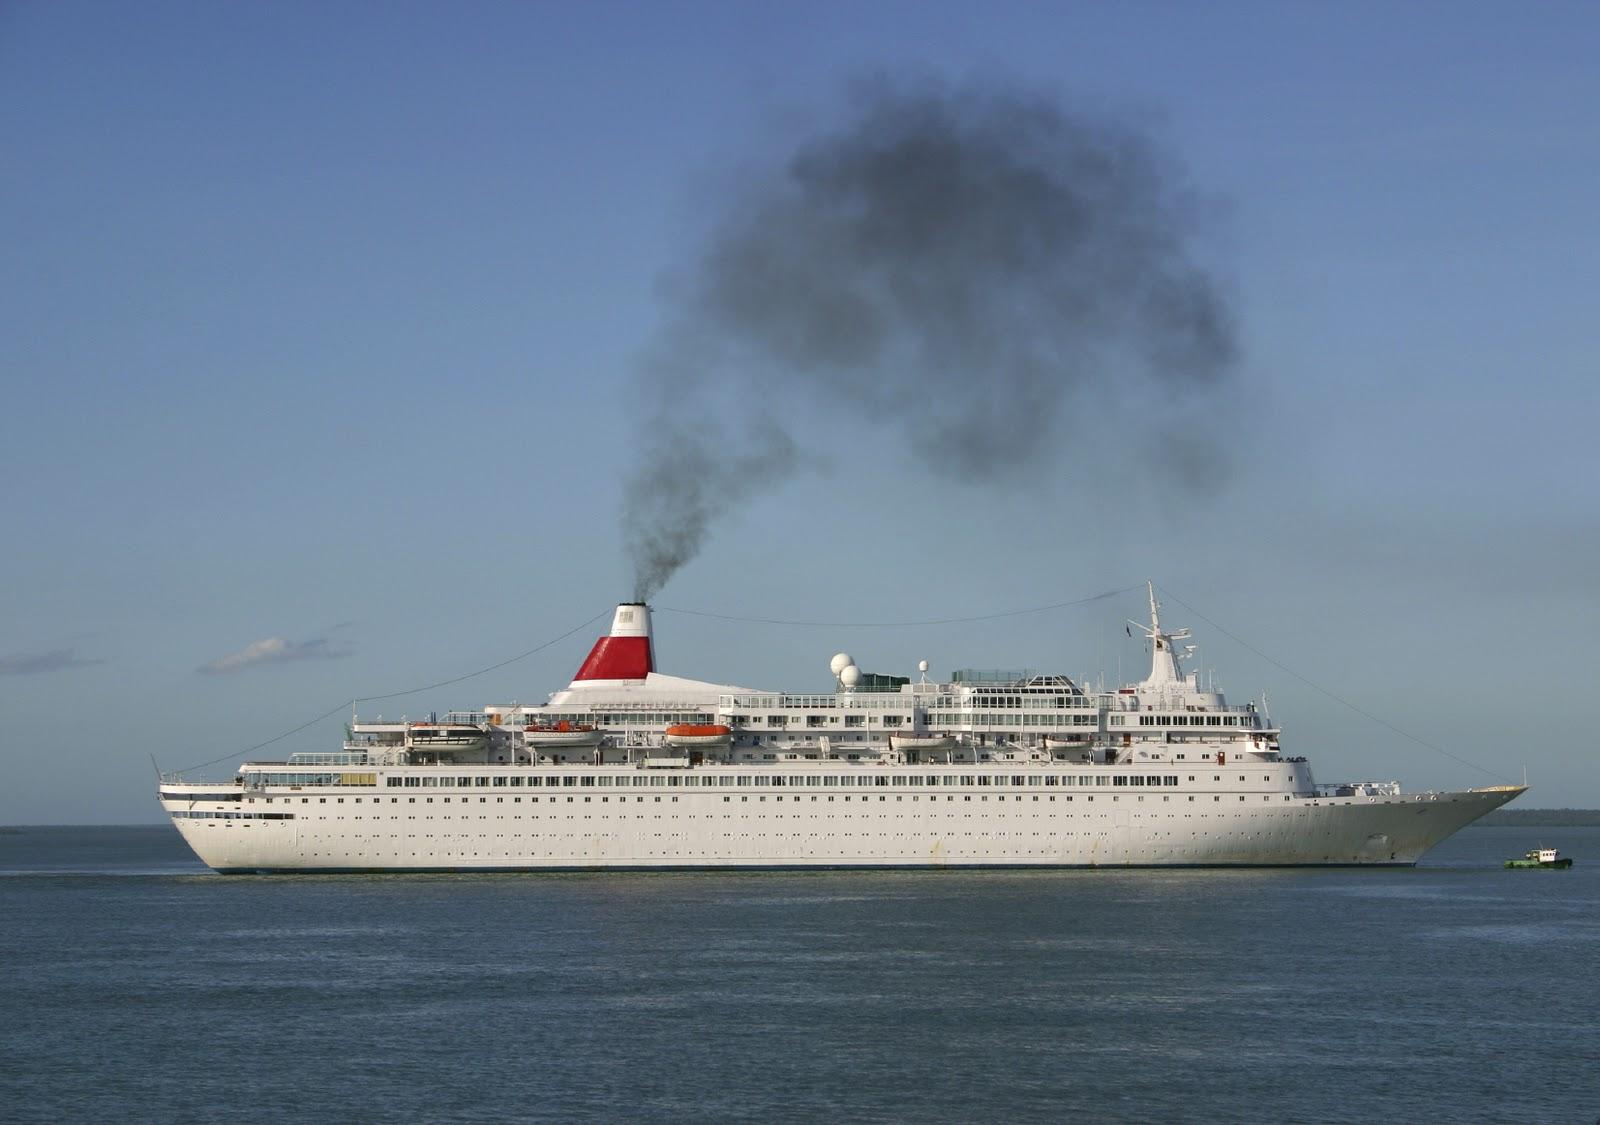 http://3.bp.blogspot.com/_kMkPsXy2RCs/TMeJ_ZtF0OI/AAAAAAAAFdE/NMehHnnXd64/s1600/cruise+ship+employment05.jpg